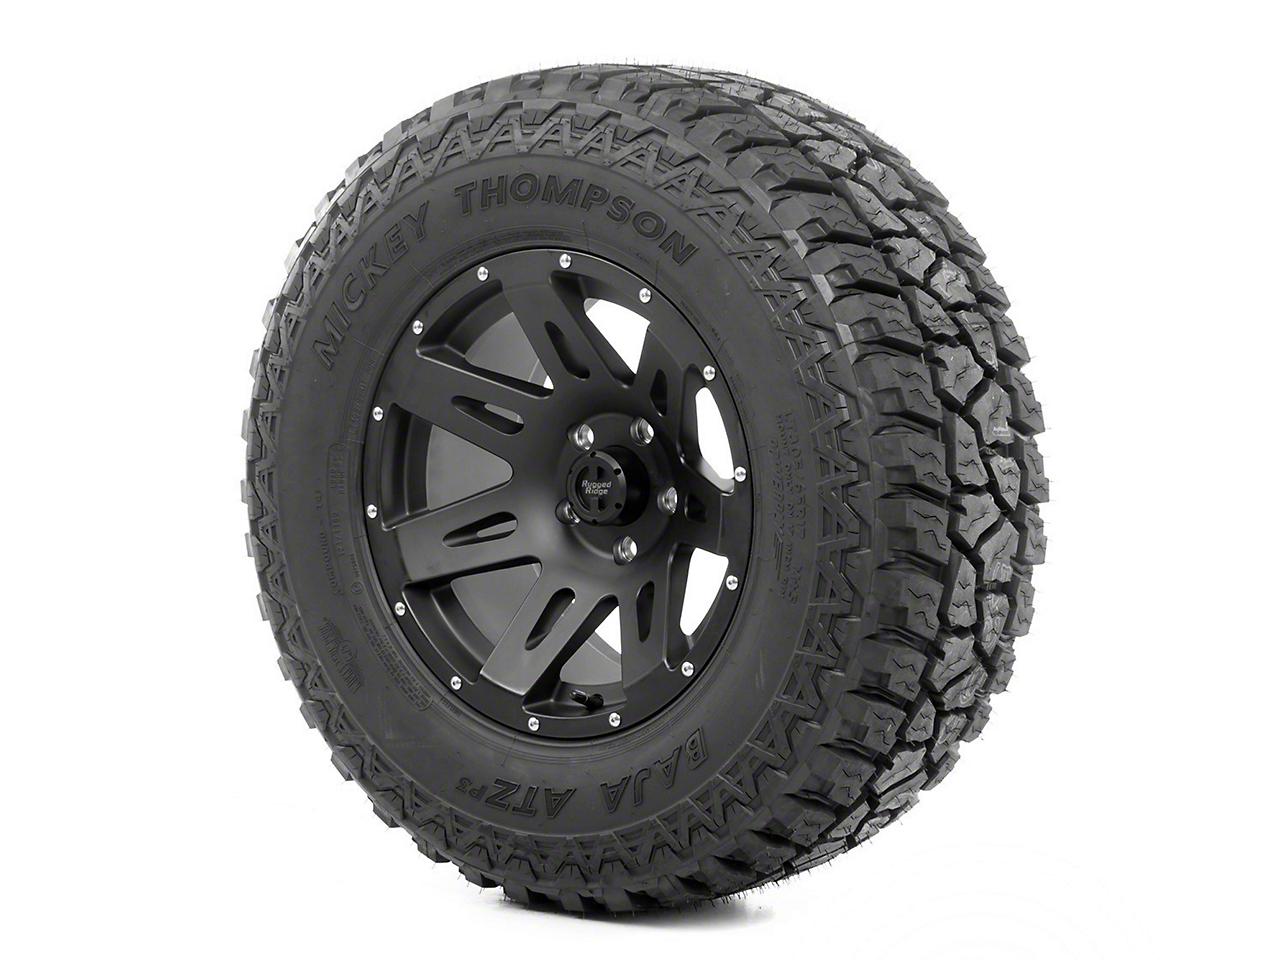 Rugged Ridge XHD Wheel 17x9 Black Satin and Mickey Thompson ATZ P3 305/65R17 Tire (07-12 Wrangler JK)